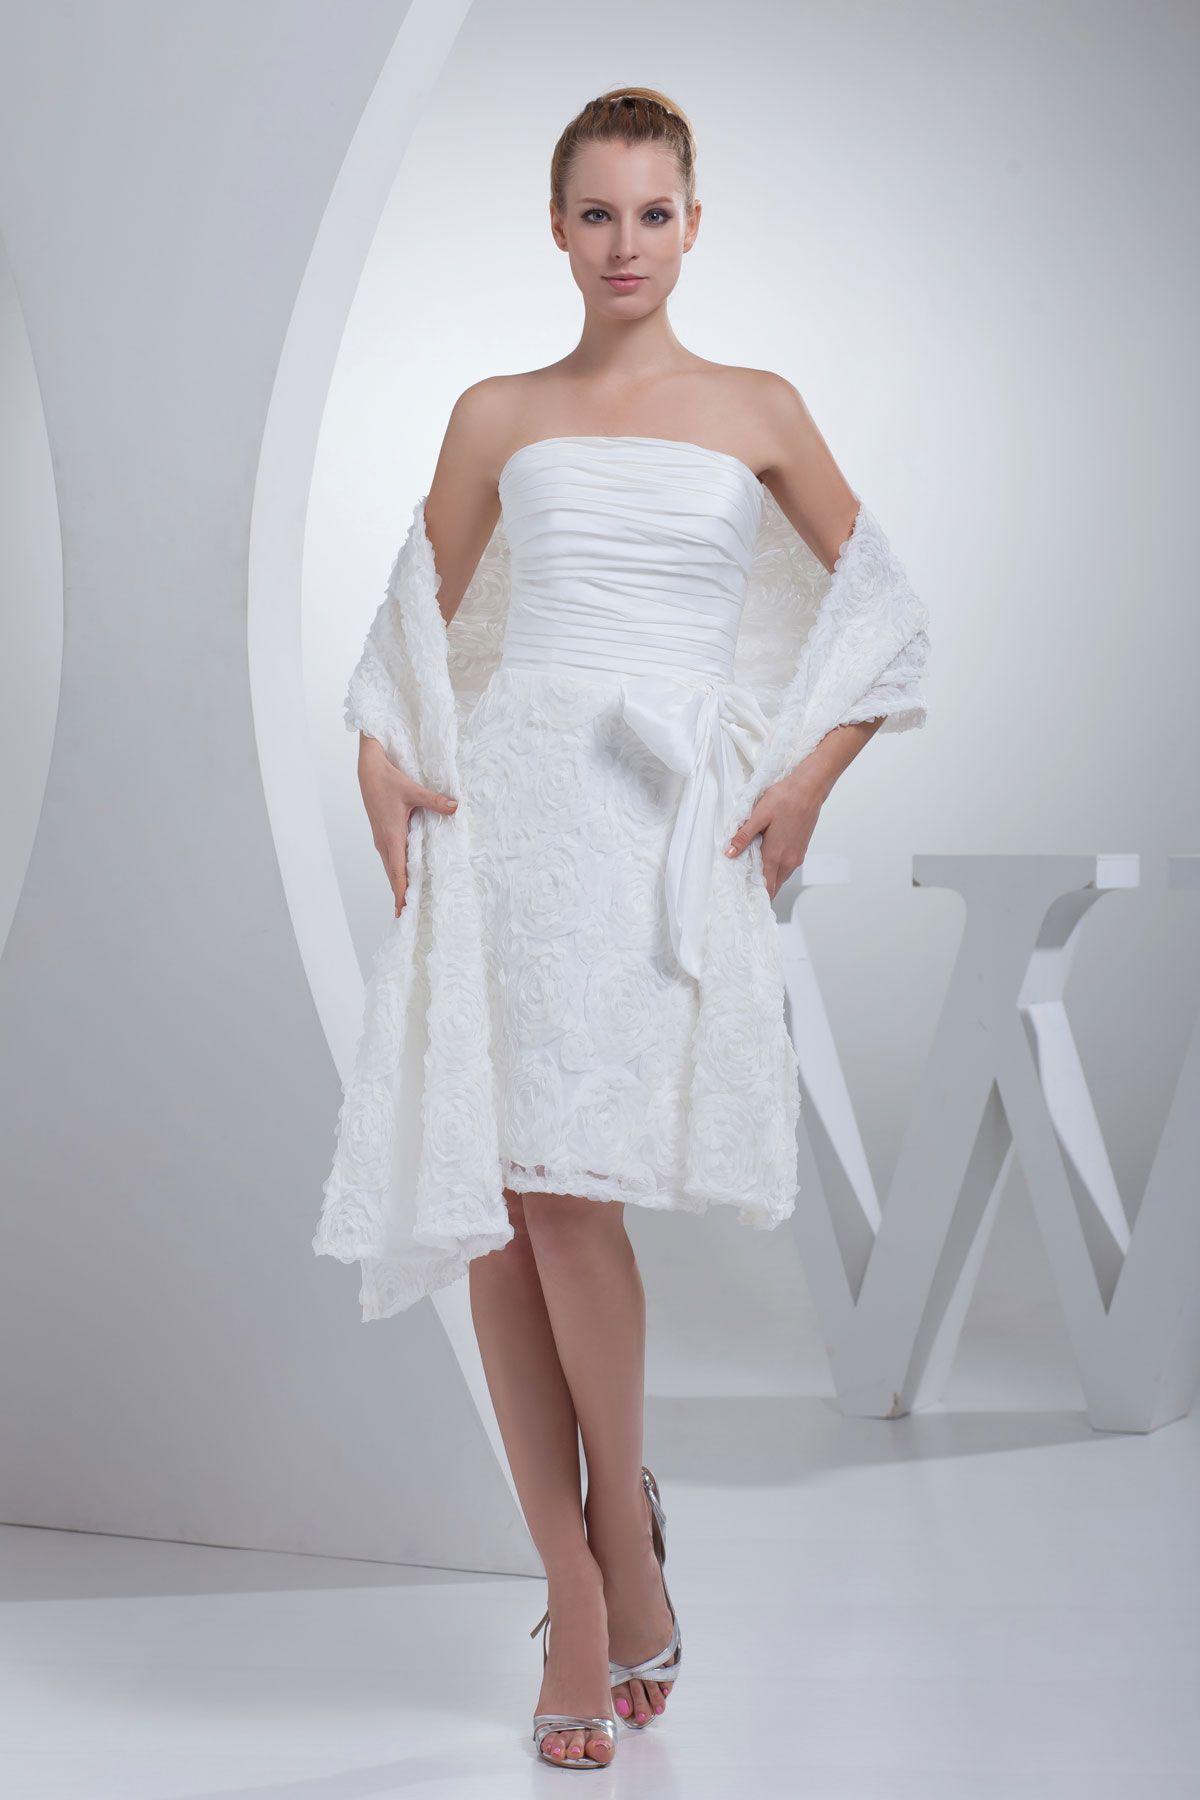 Princess White Taffeta Short Strapless Wedding Dress   Wedding ...